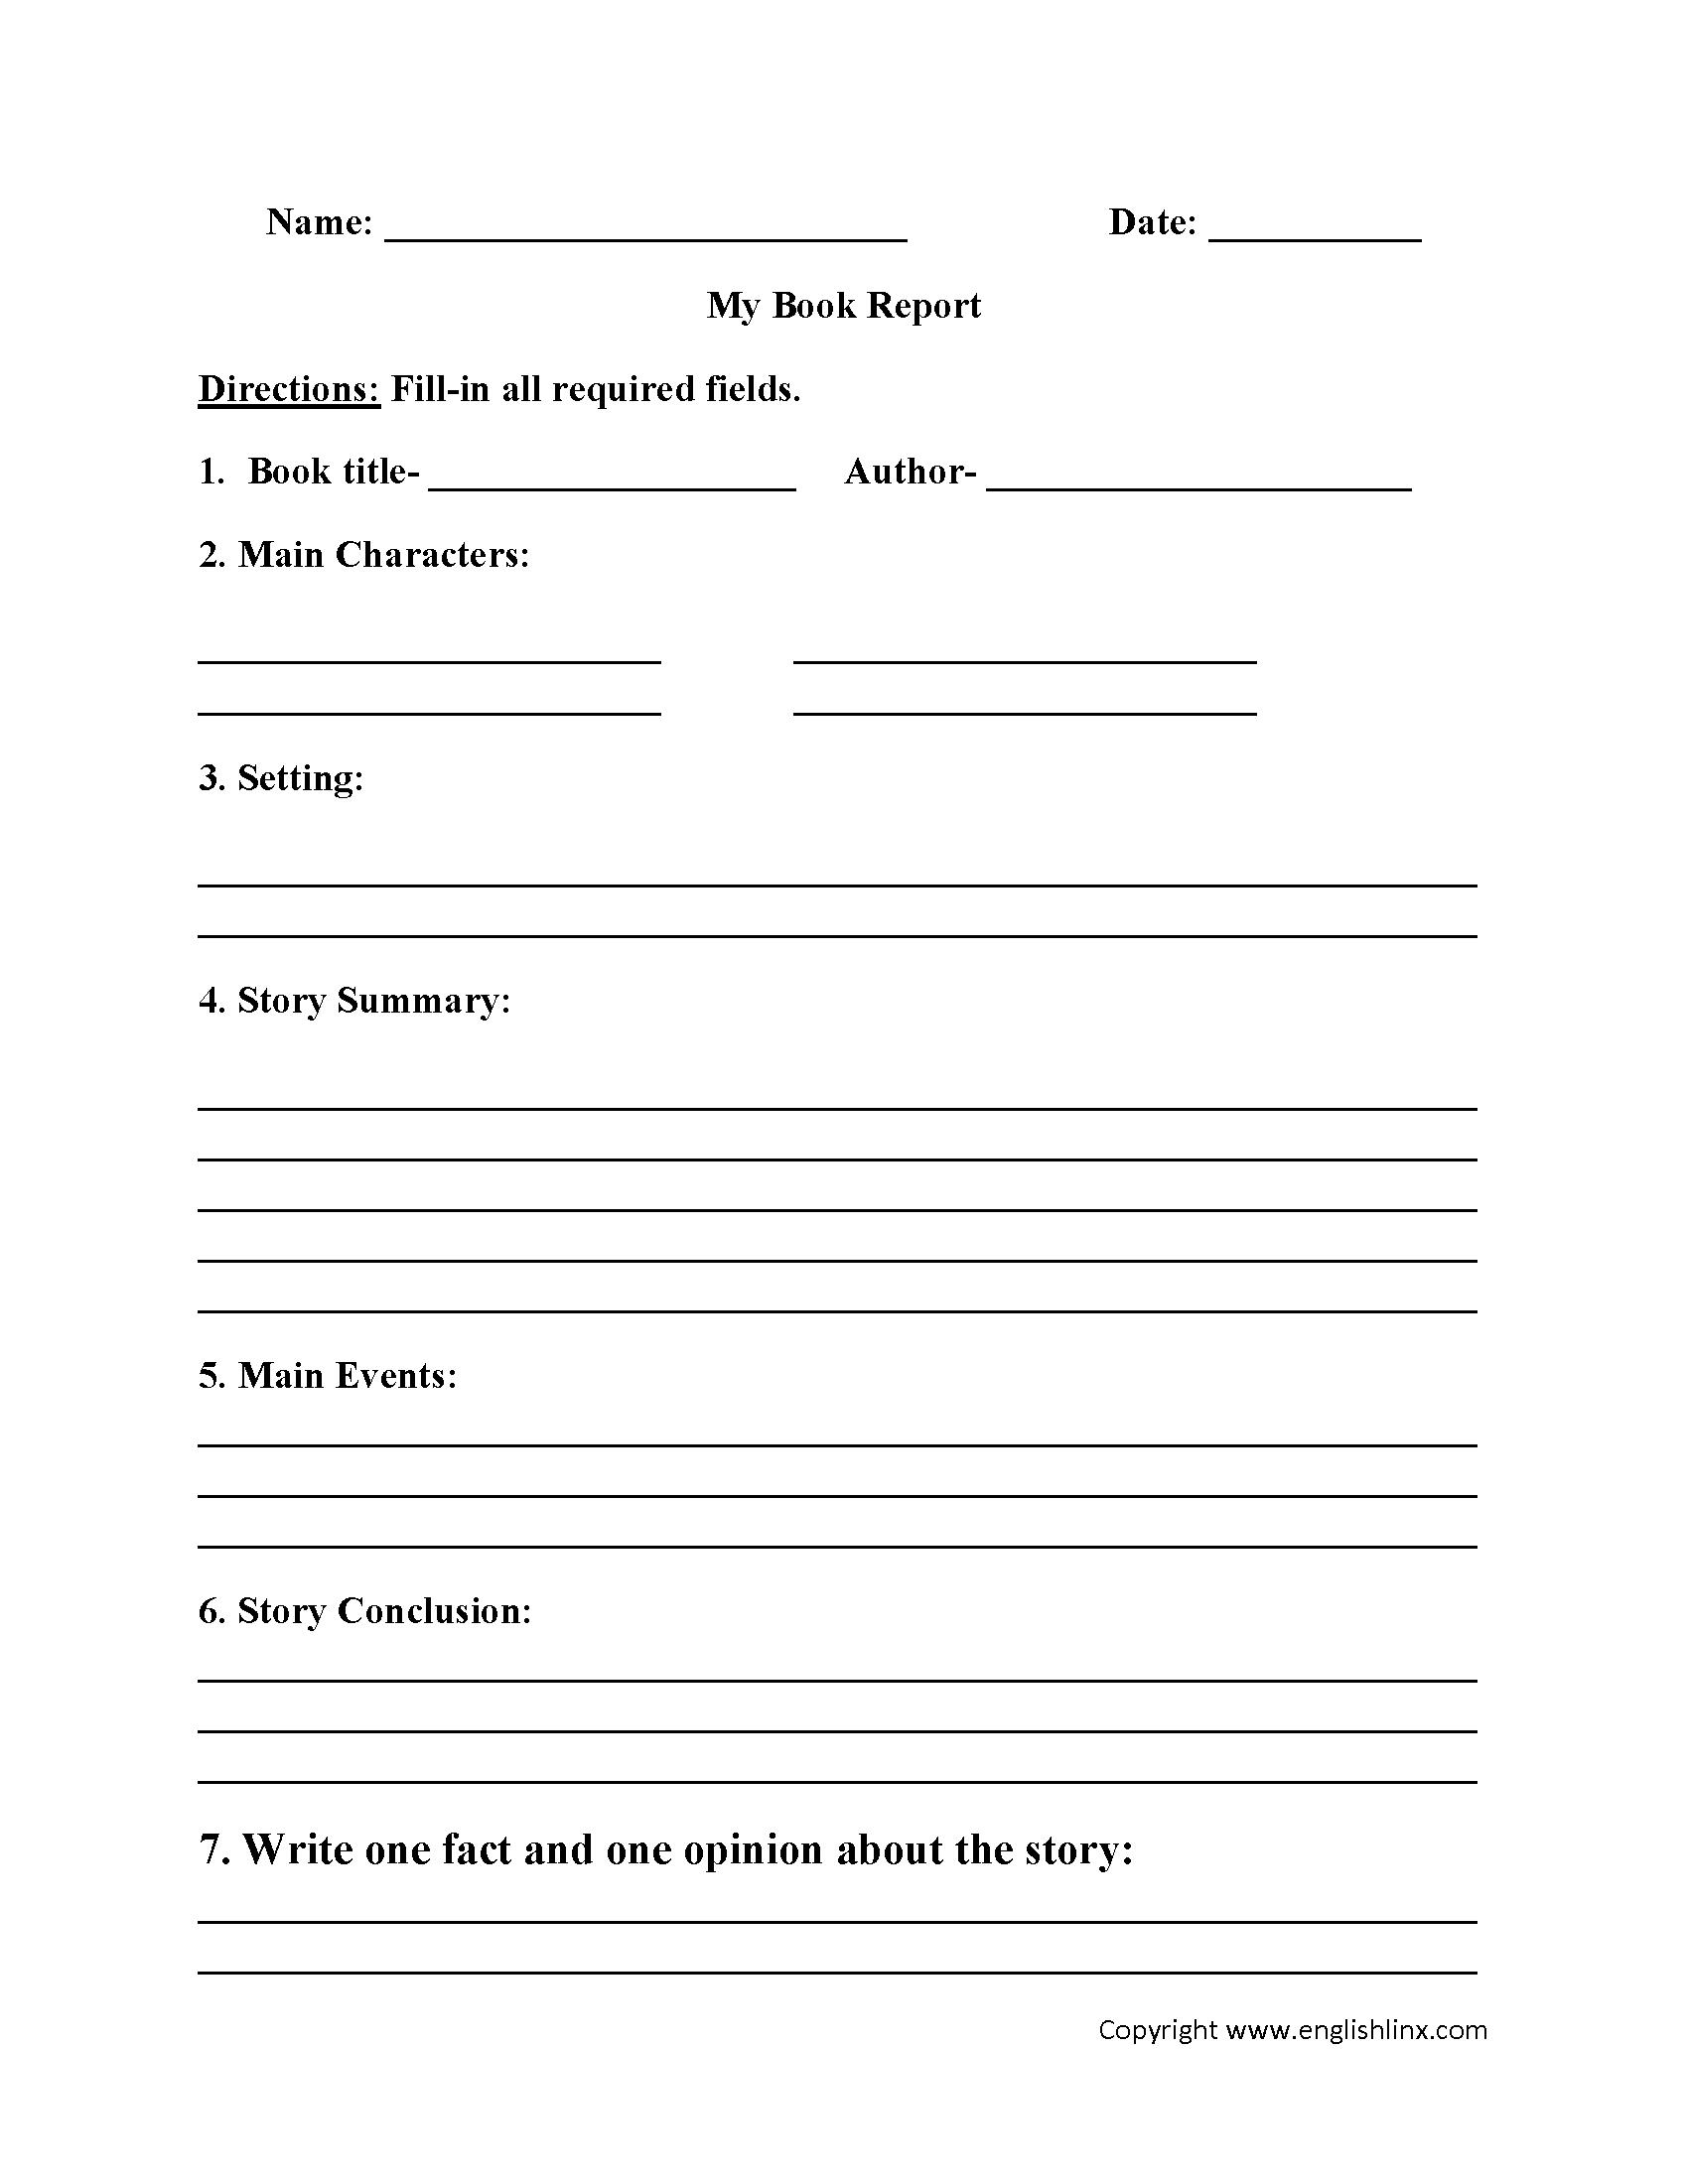 Write my book reports